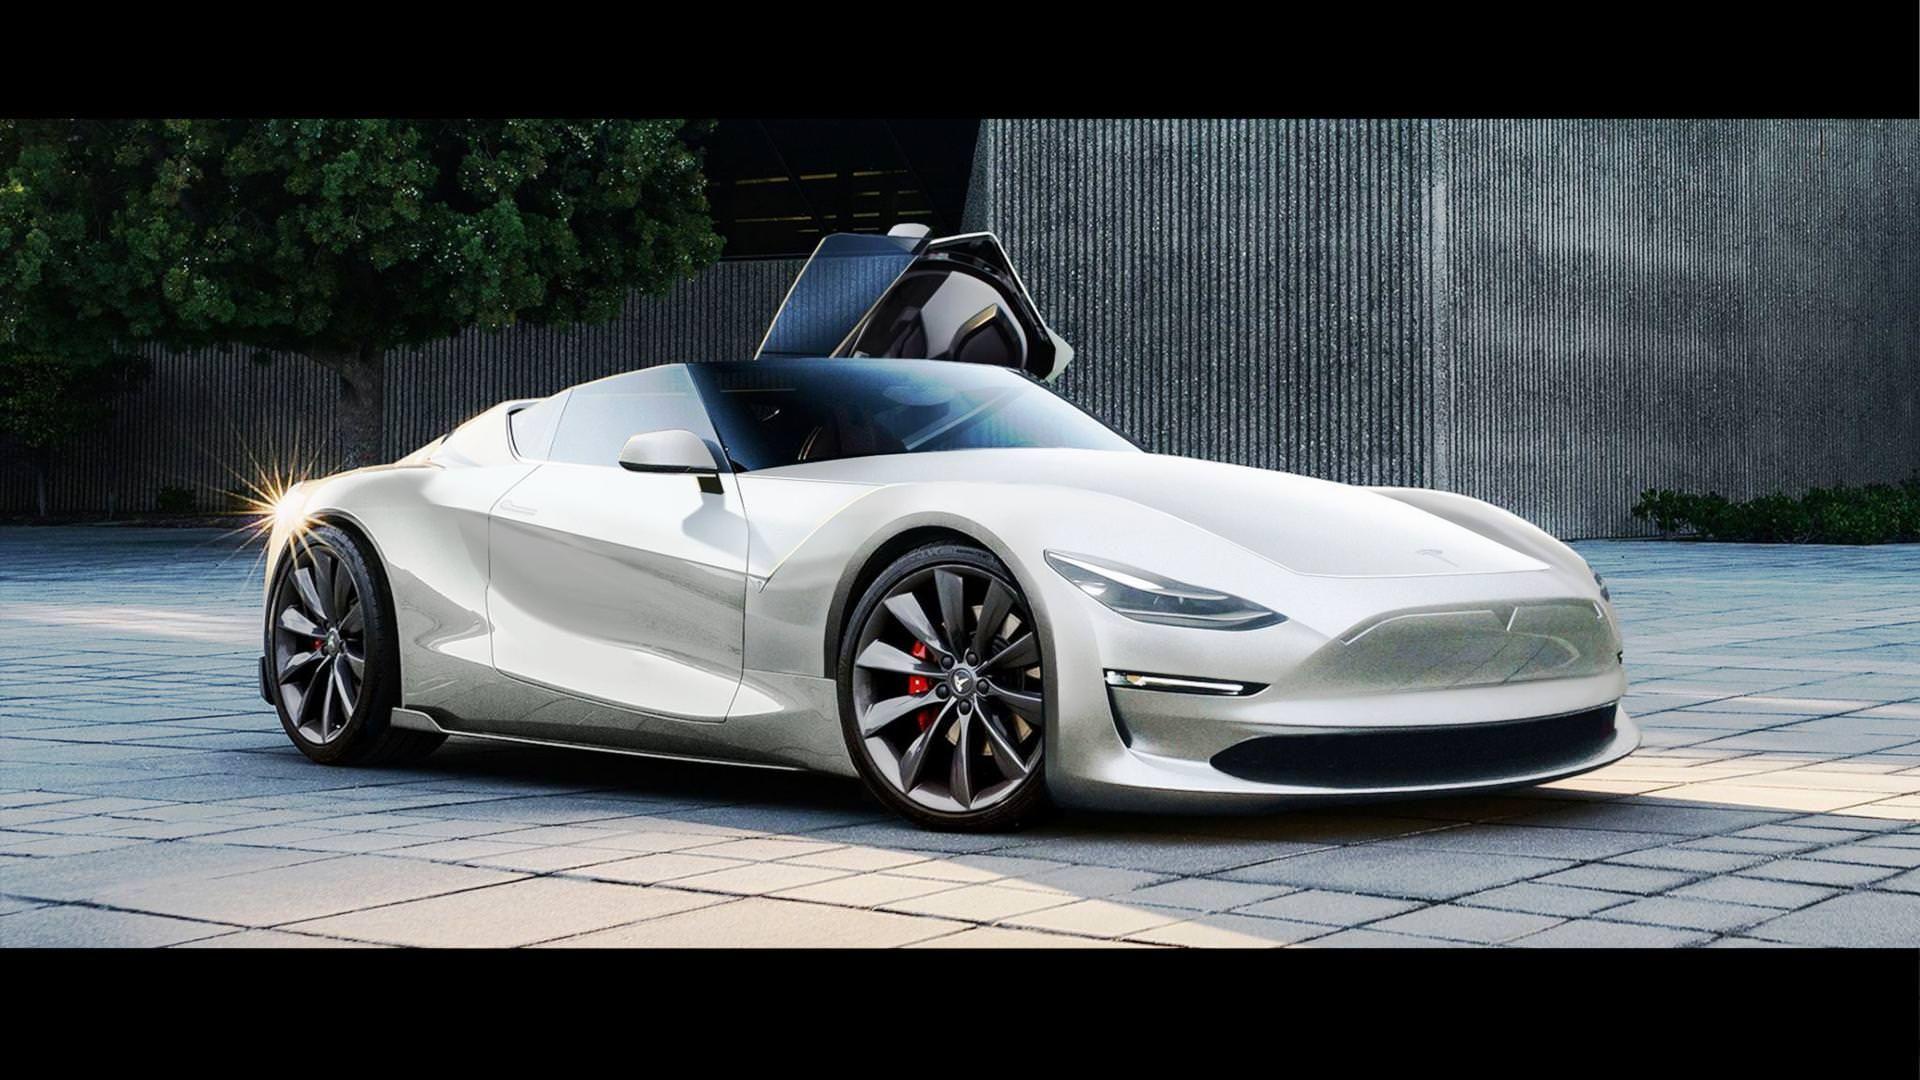 Tesla Roadster Wallpaper For Iphone tesla roadster